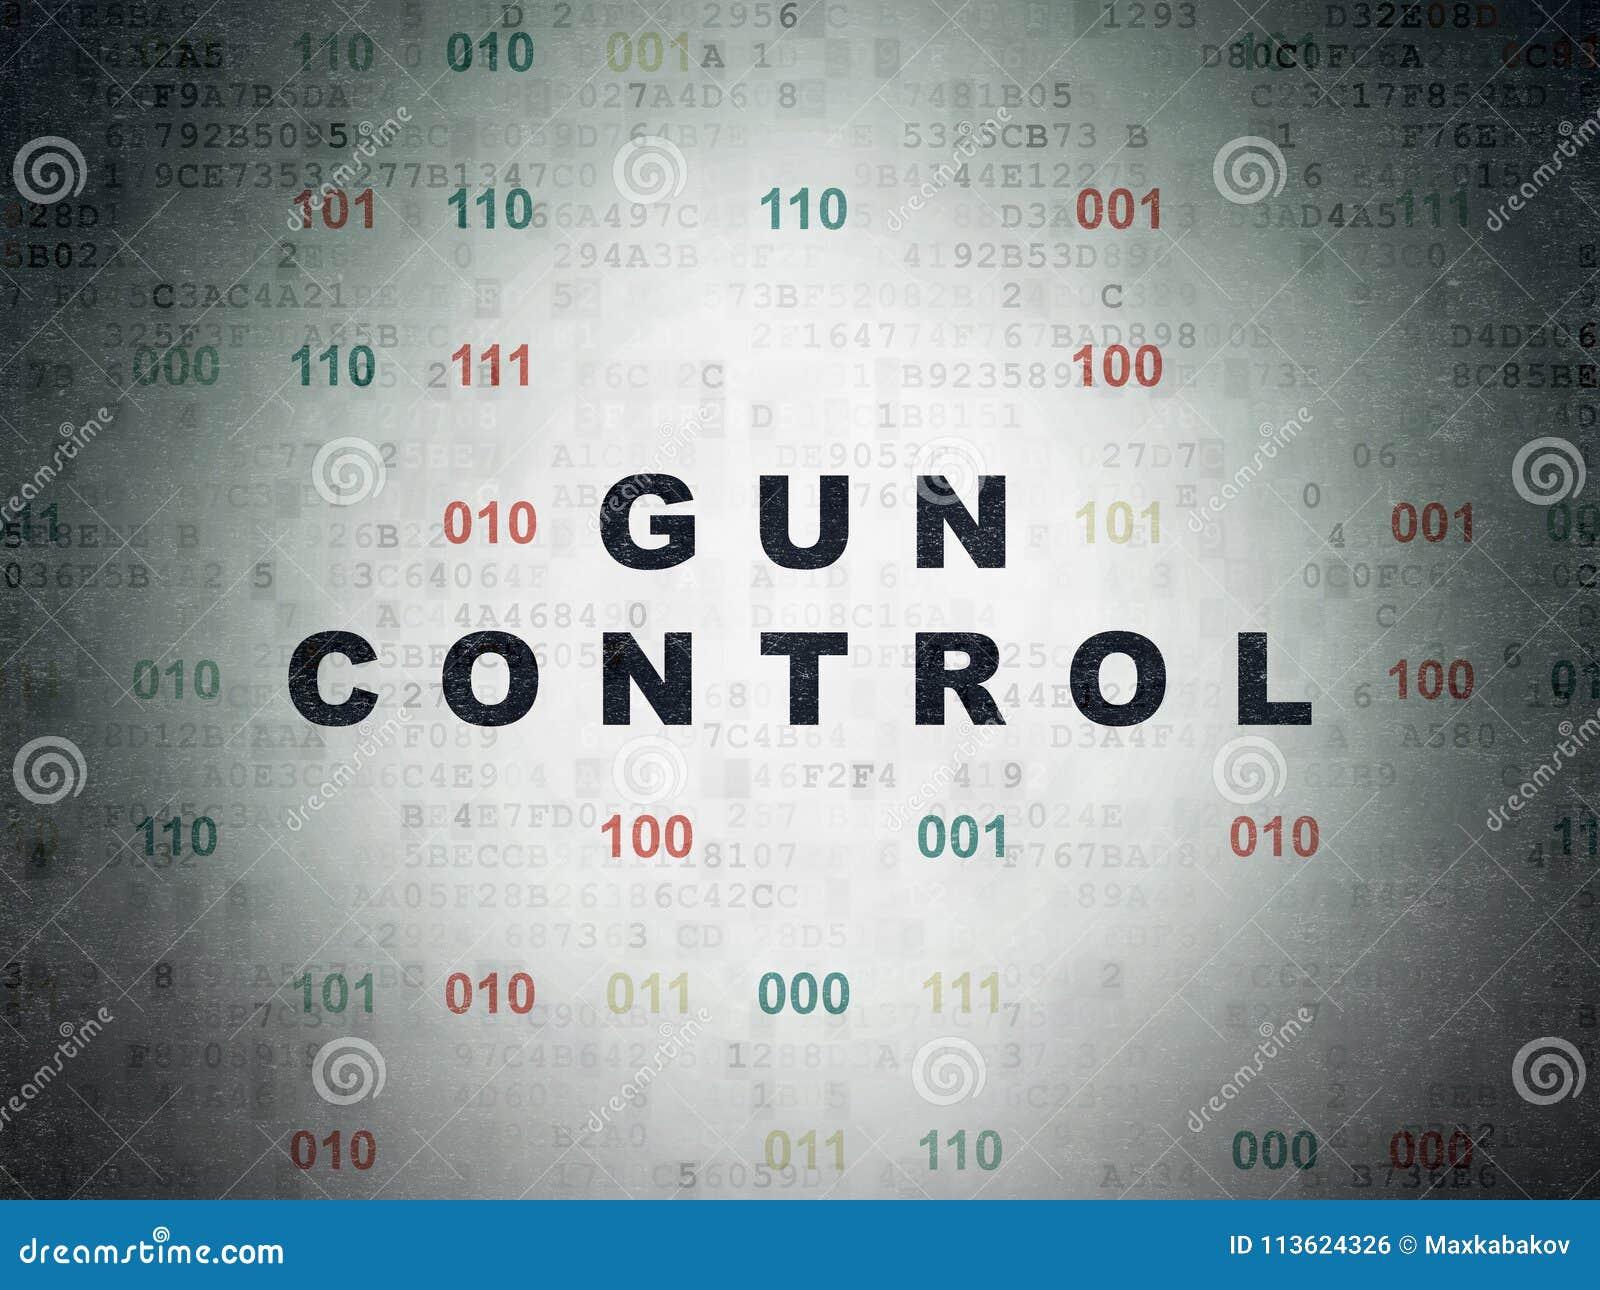 gun control paper